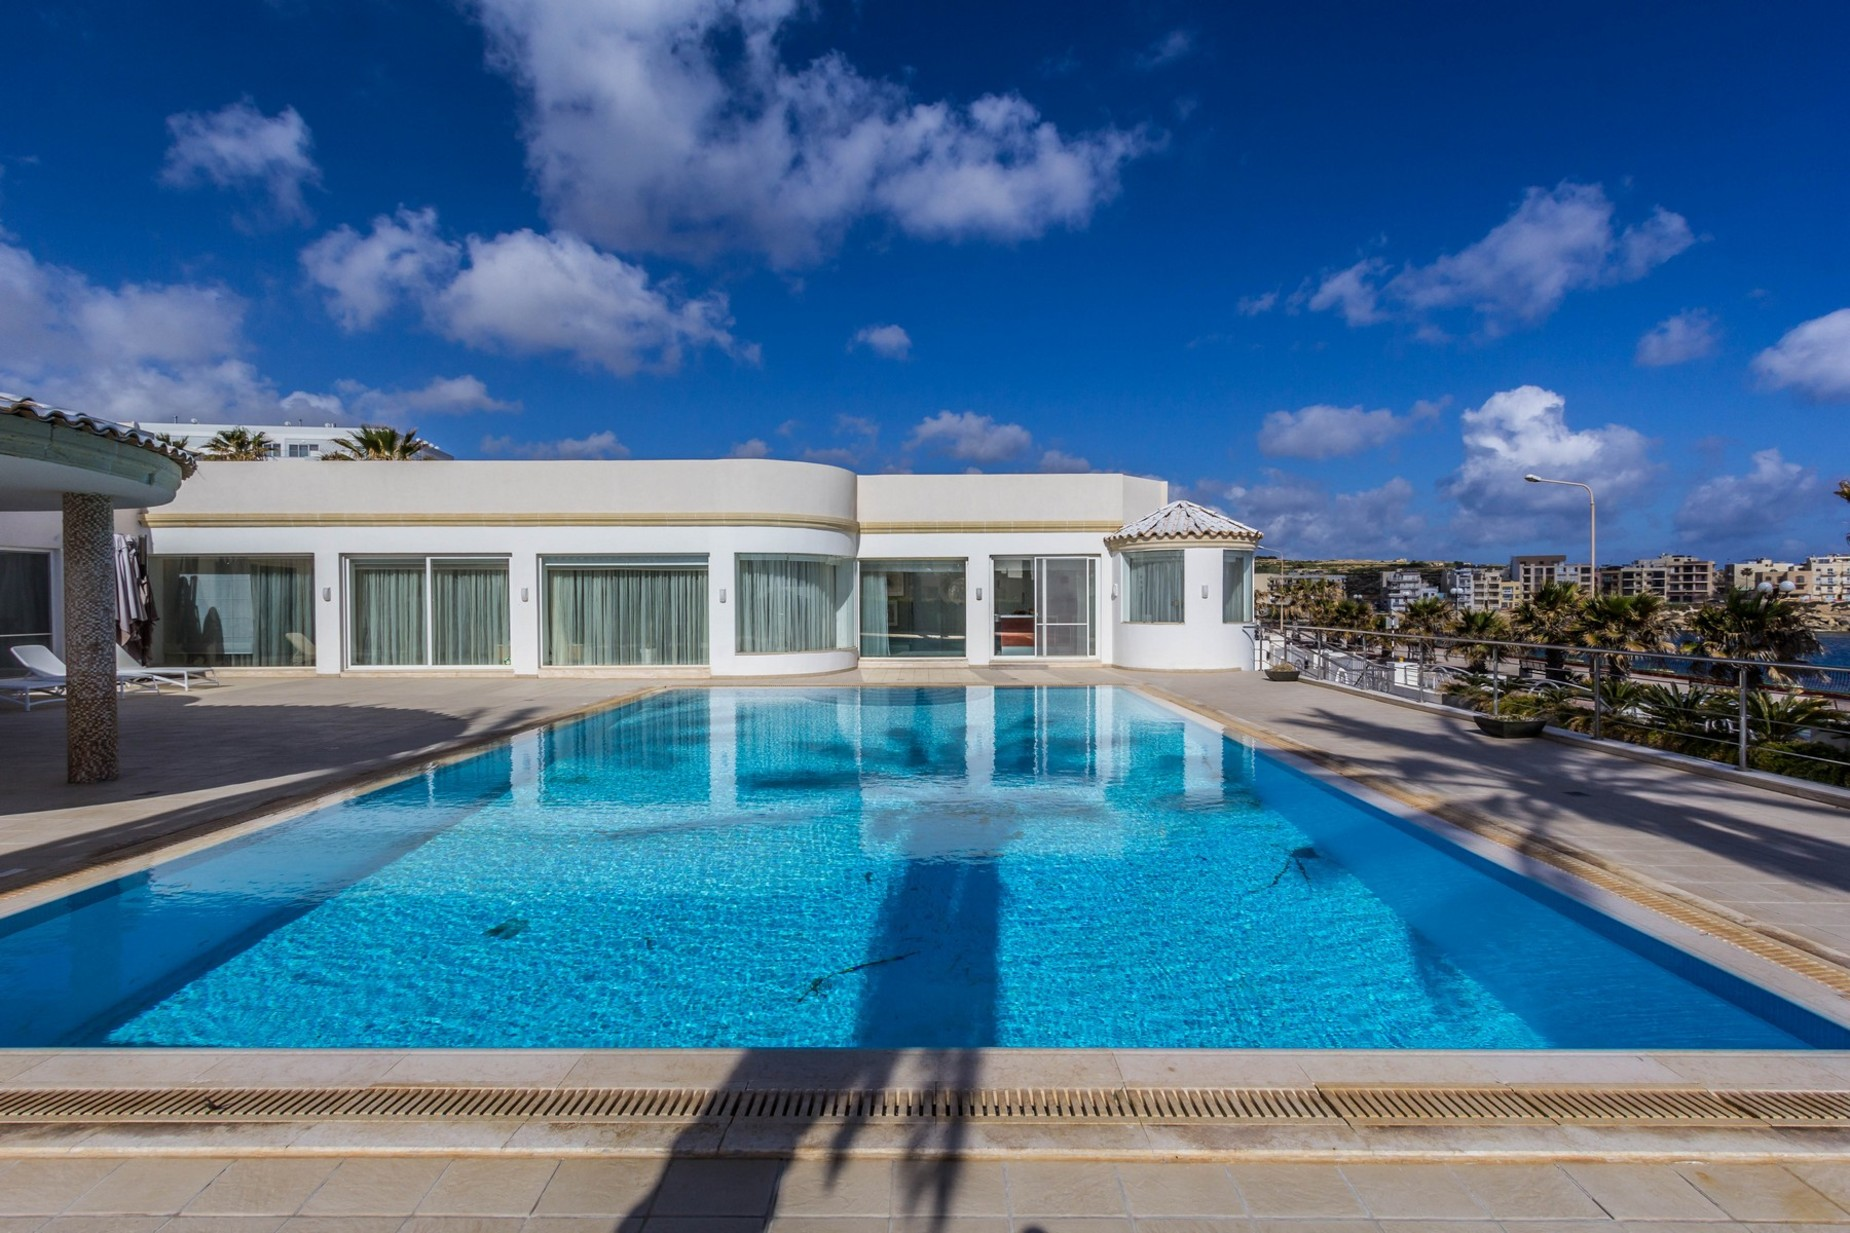 4 bed Villa For Sale in Marsascala, Marsascala - thumb 5